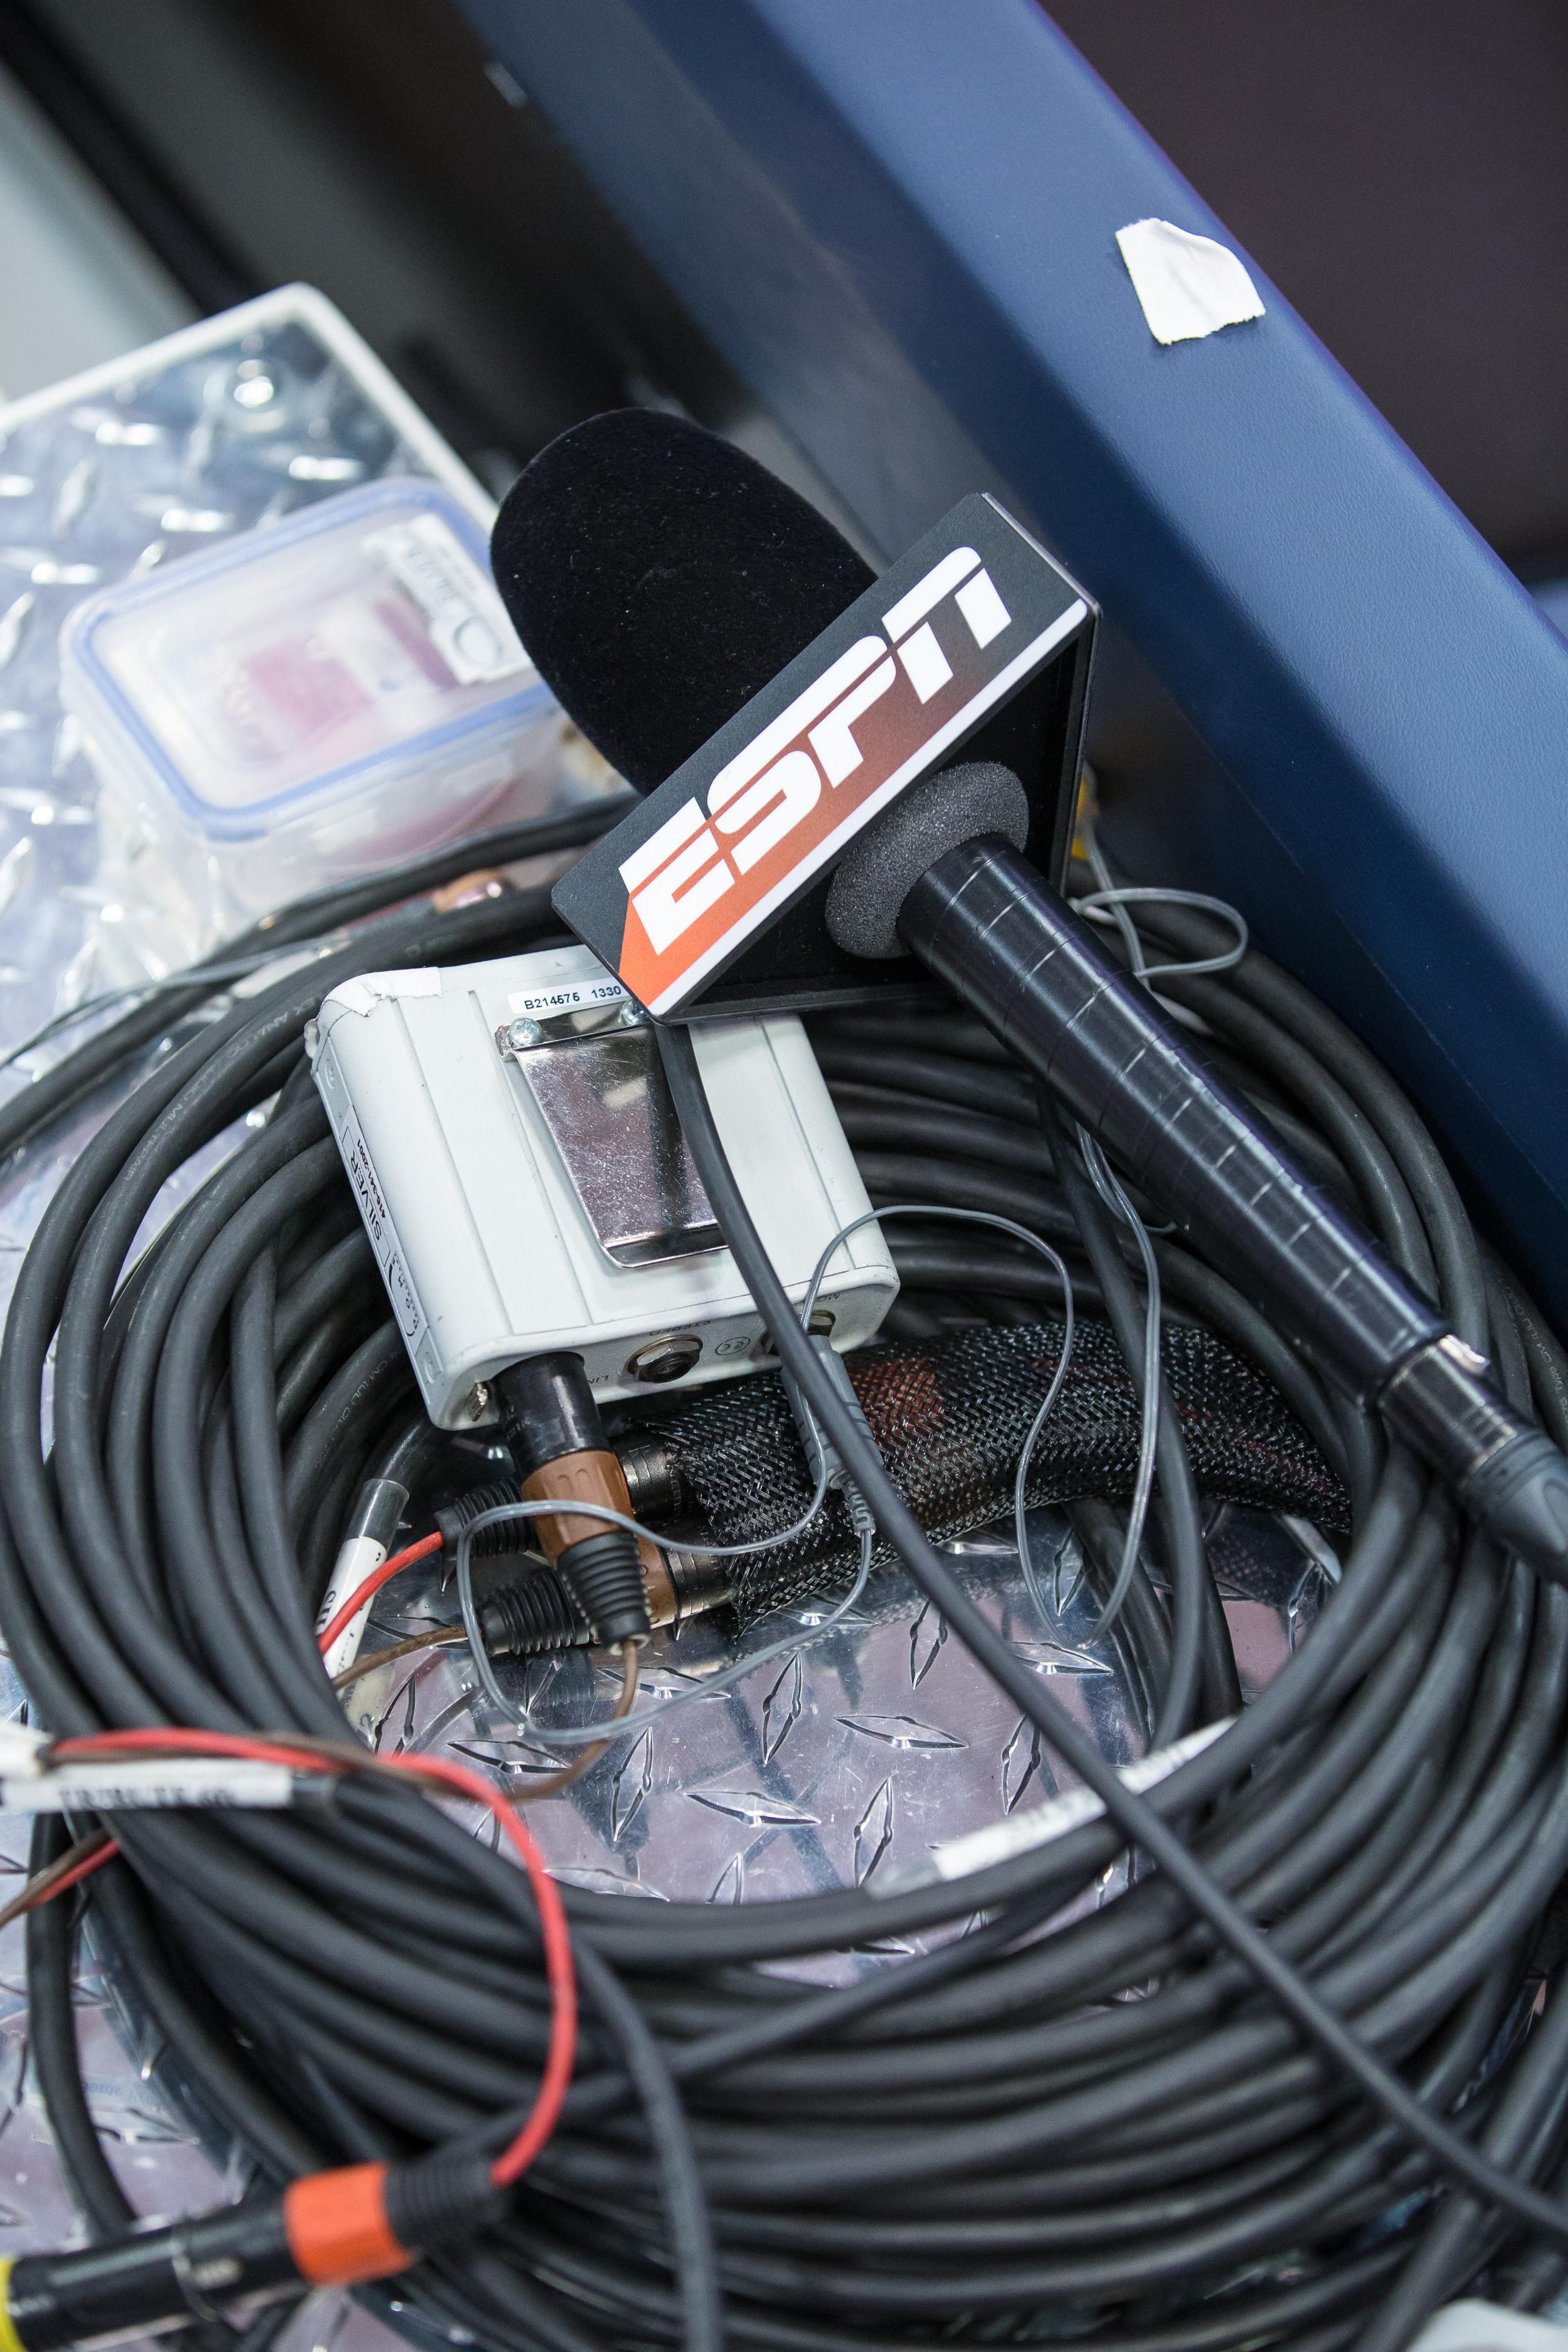 ESPN broadcast microphone